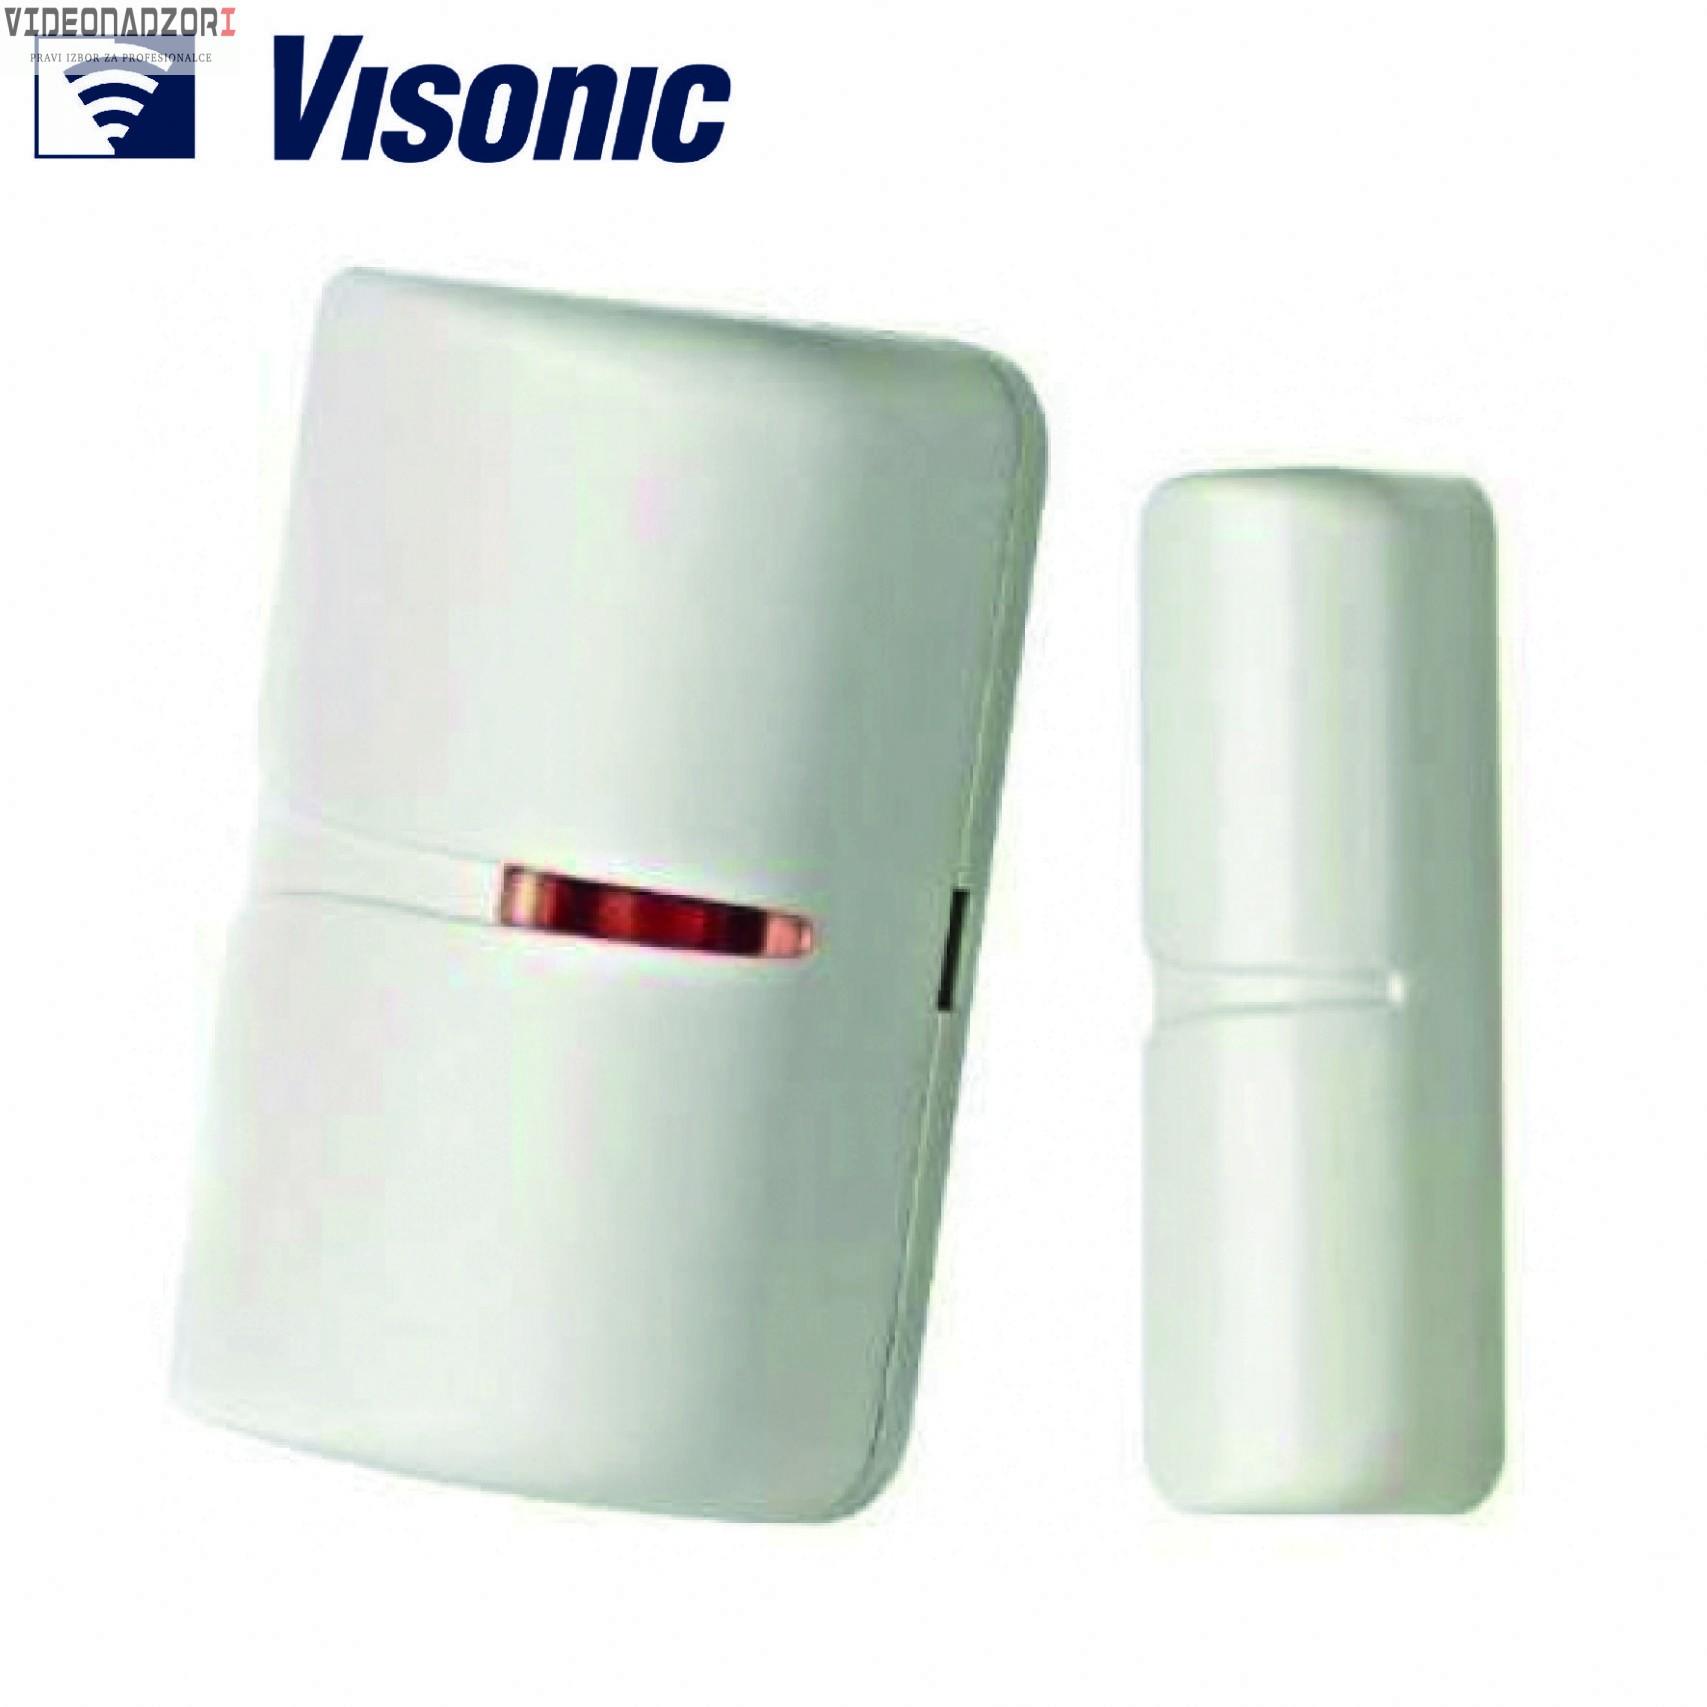 Visonic bežični senzor vrata i prozora MCT-320 prodavac VideoNadzori Hrvatska  za 373,75kn